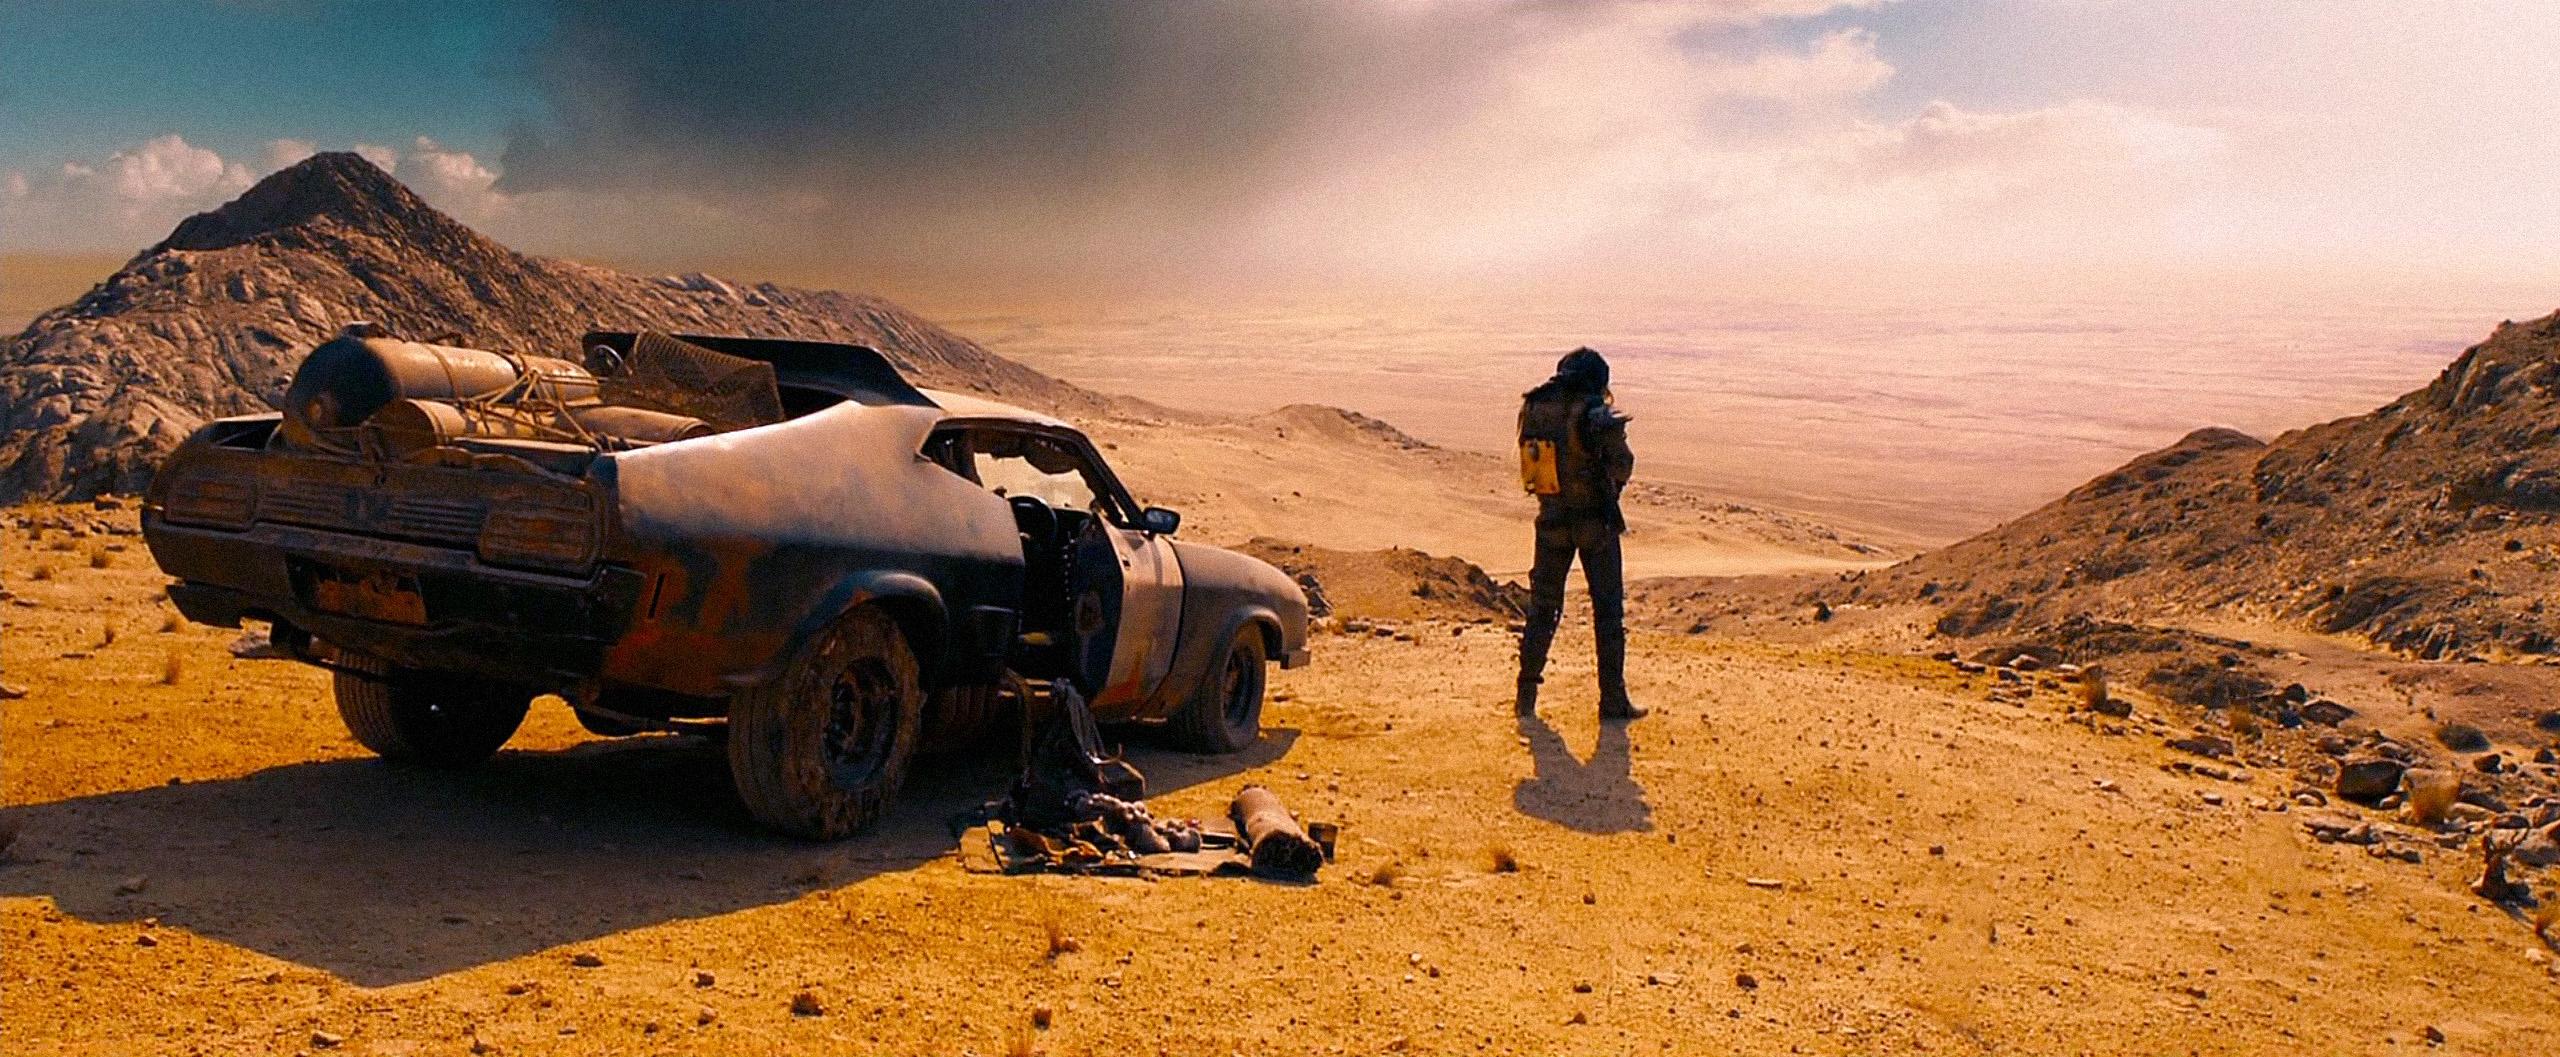 Max (Tom Hardy) - Mad Max : Fury Road